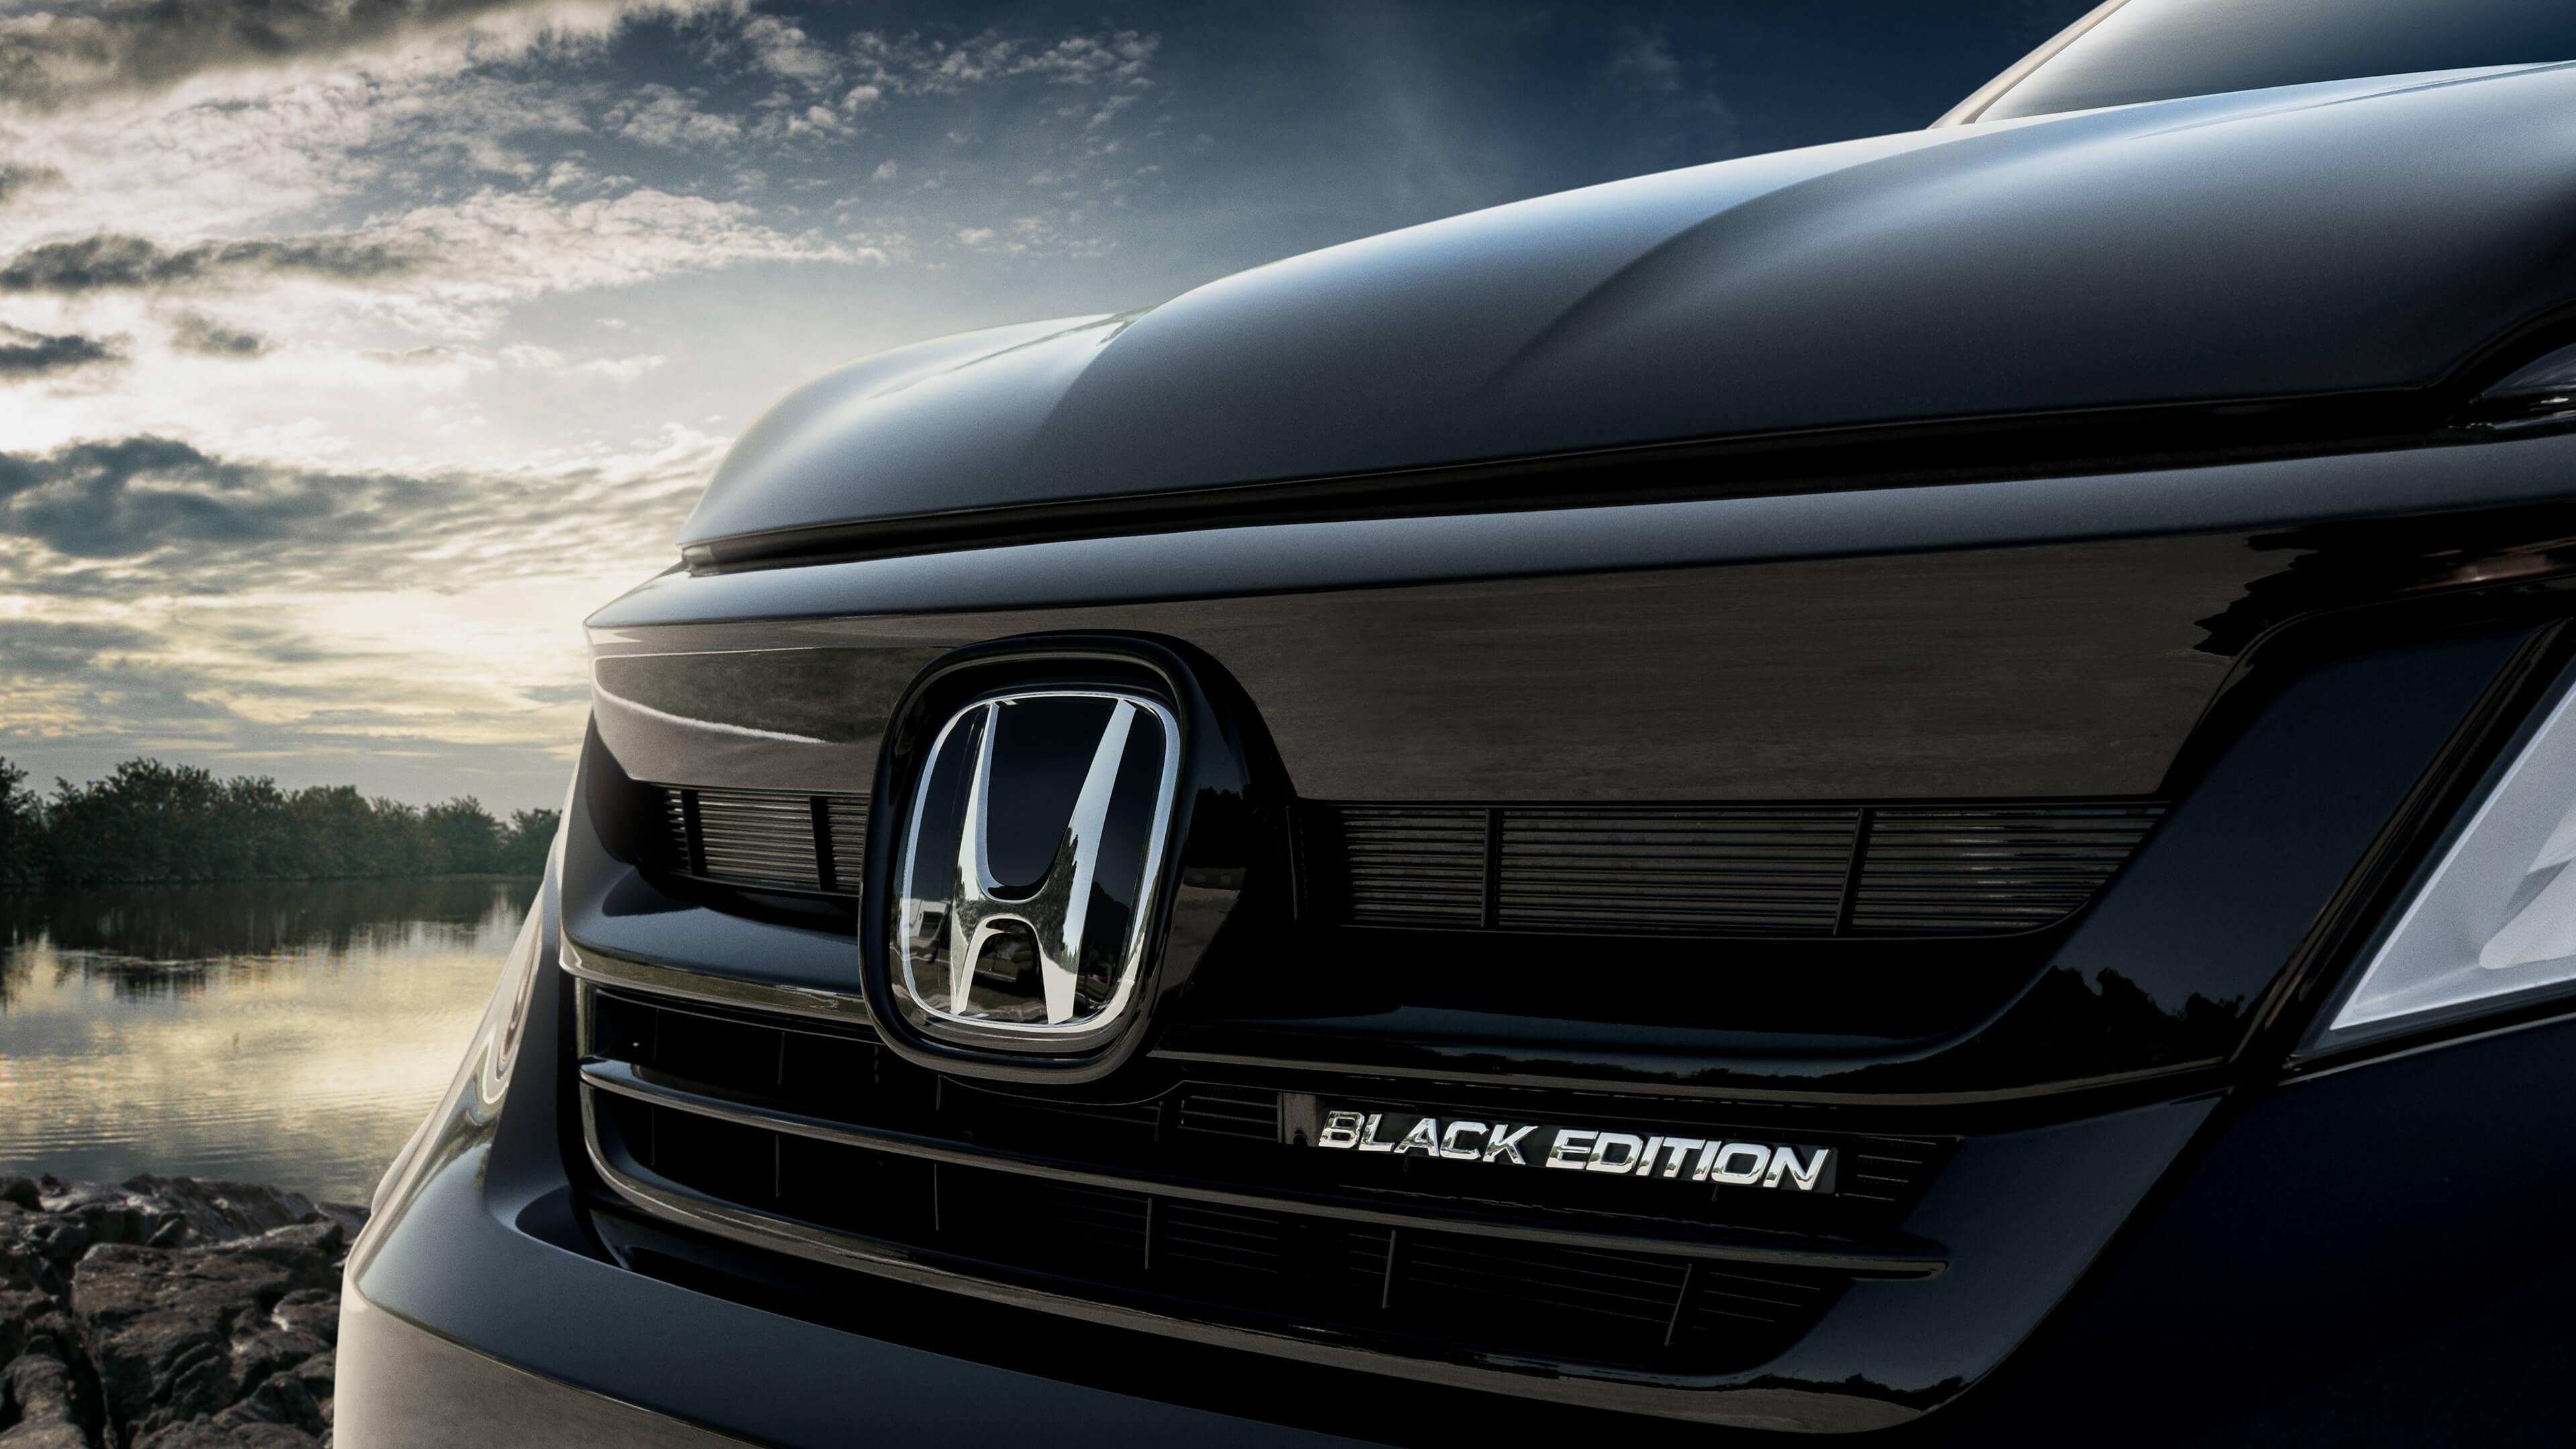 The 2019 Pilot Black Edition Dow Honda